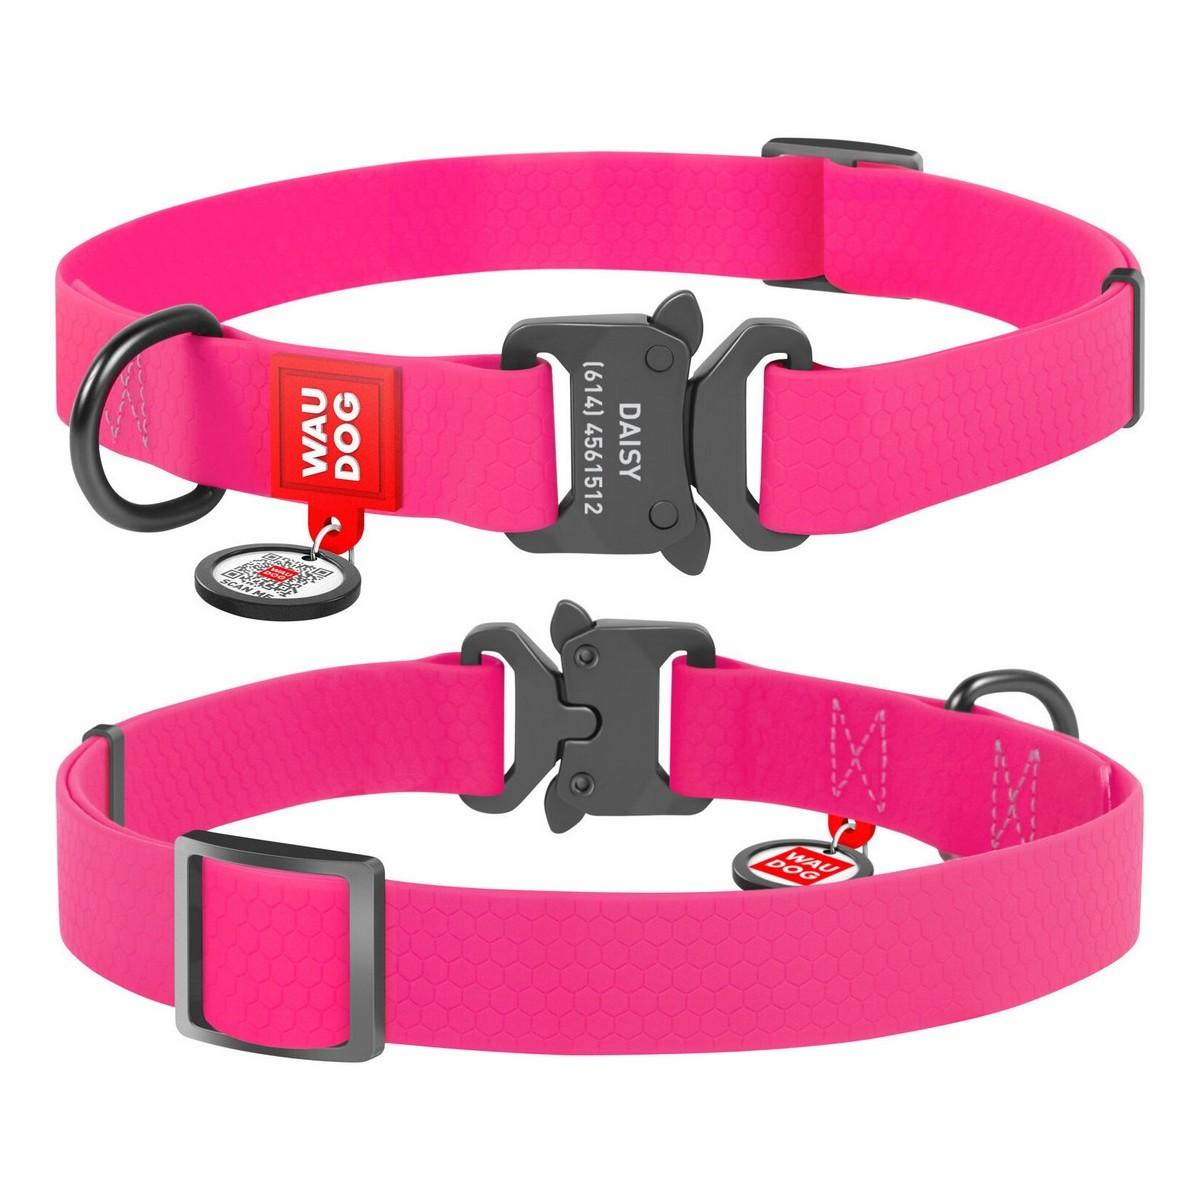 Нашийник для собак водостійкий WAUDOG Waterproof, металева пряжка-фастекс, рожевий